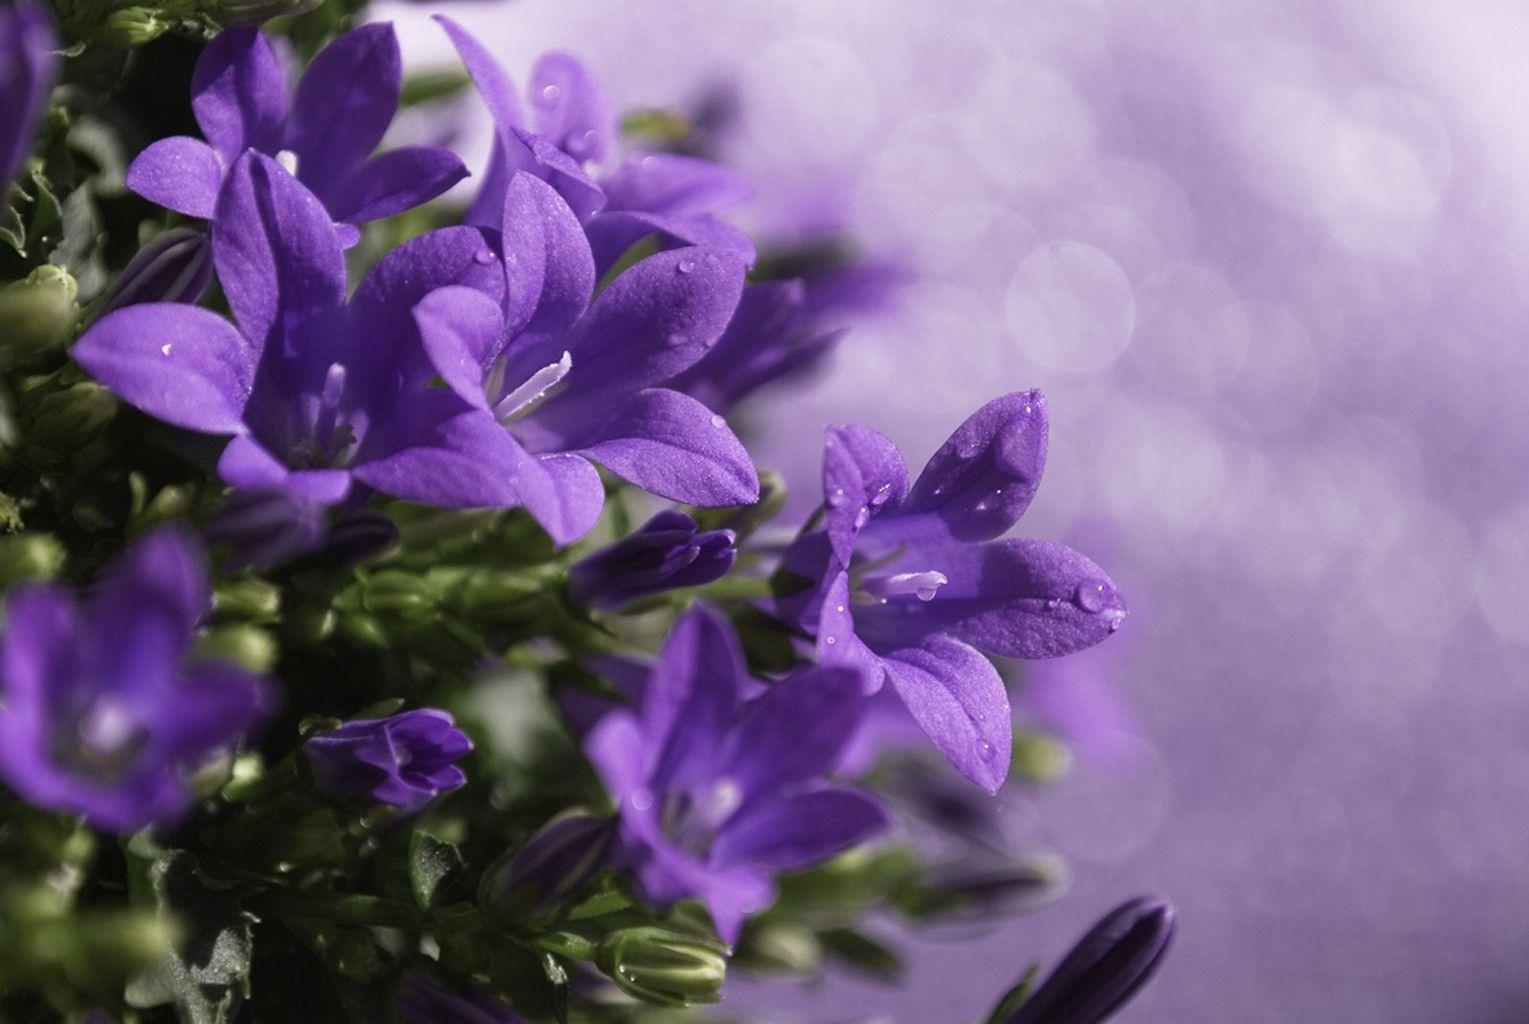 Cool purple wallpapers wallpaper cave for Sfondi hd viola